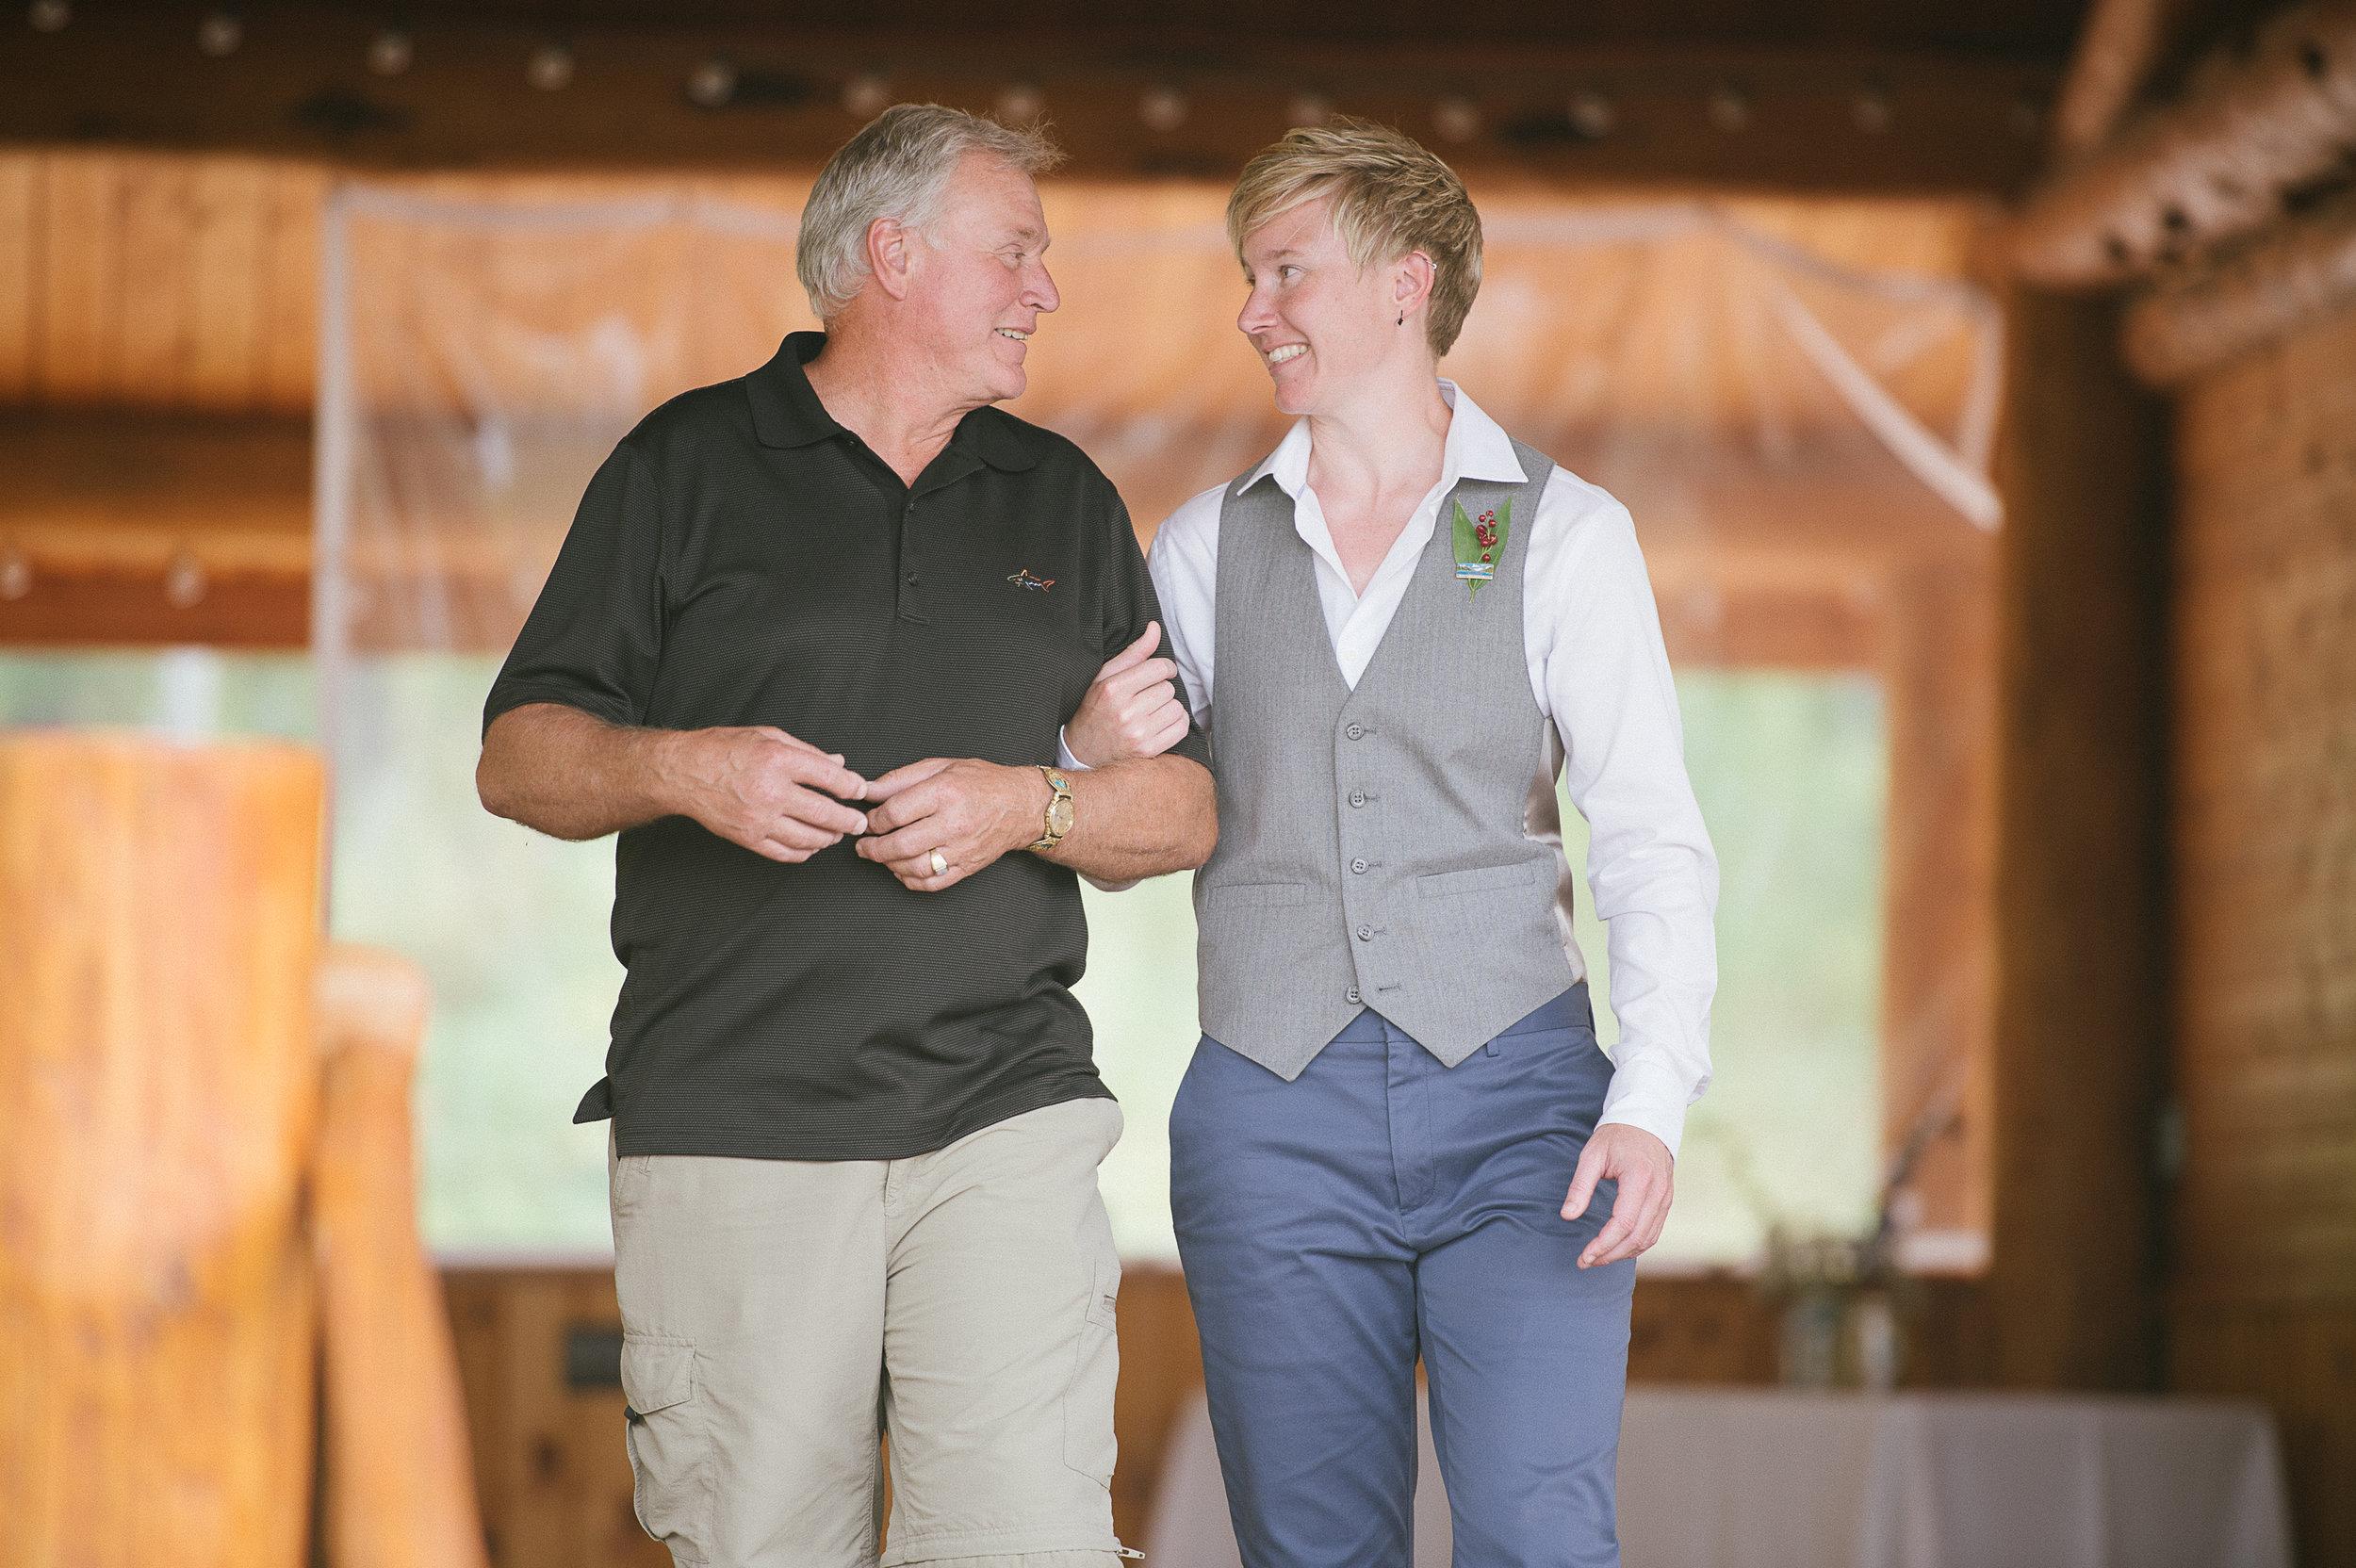 Glacier Montana Wedding_Elly Maurer + Frankie Dashiell Wedding_Beautiful Outdoor Wedding_Kelsey Lane Photography-4897.jpg